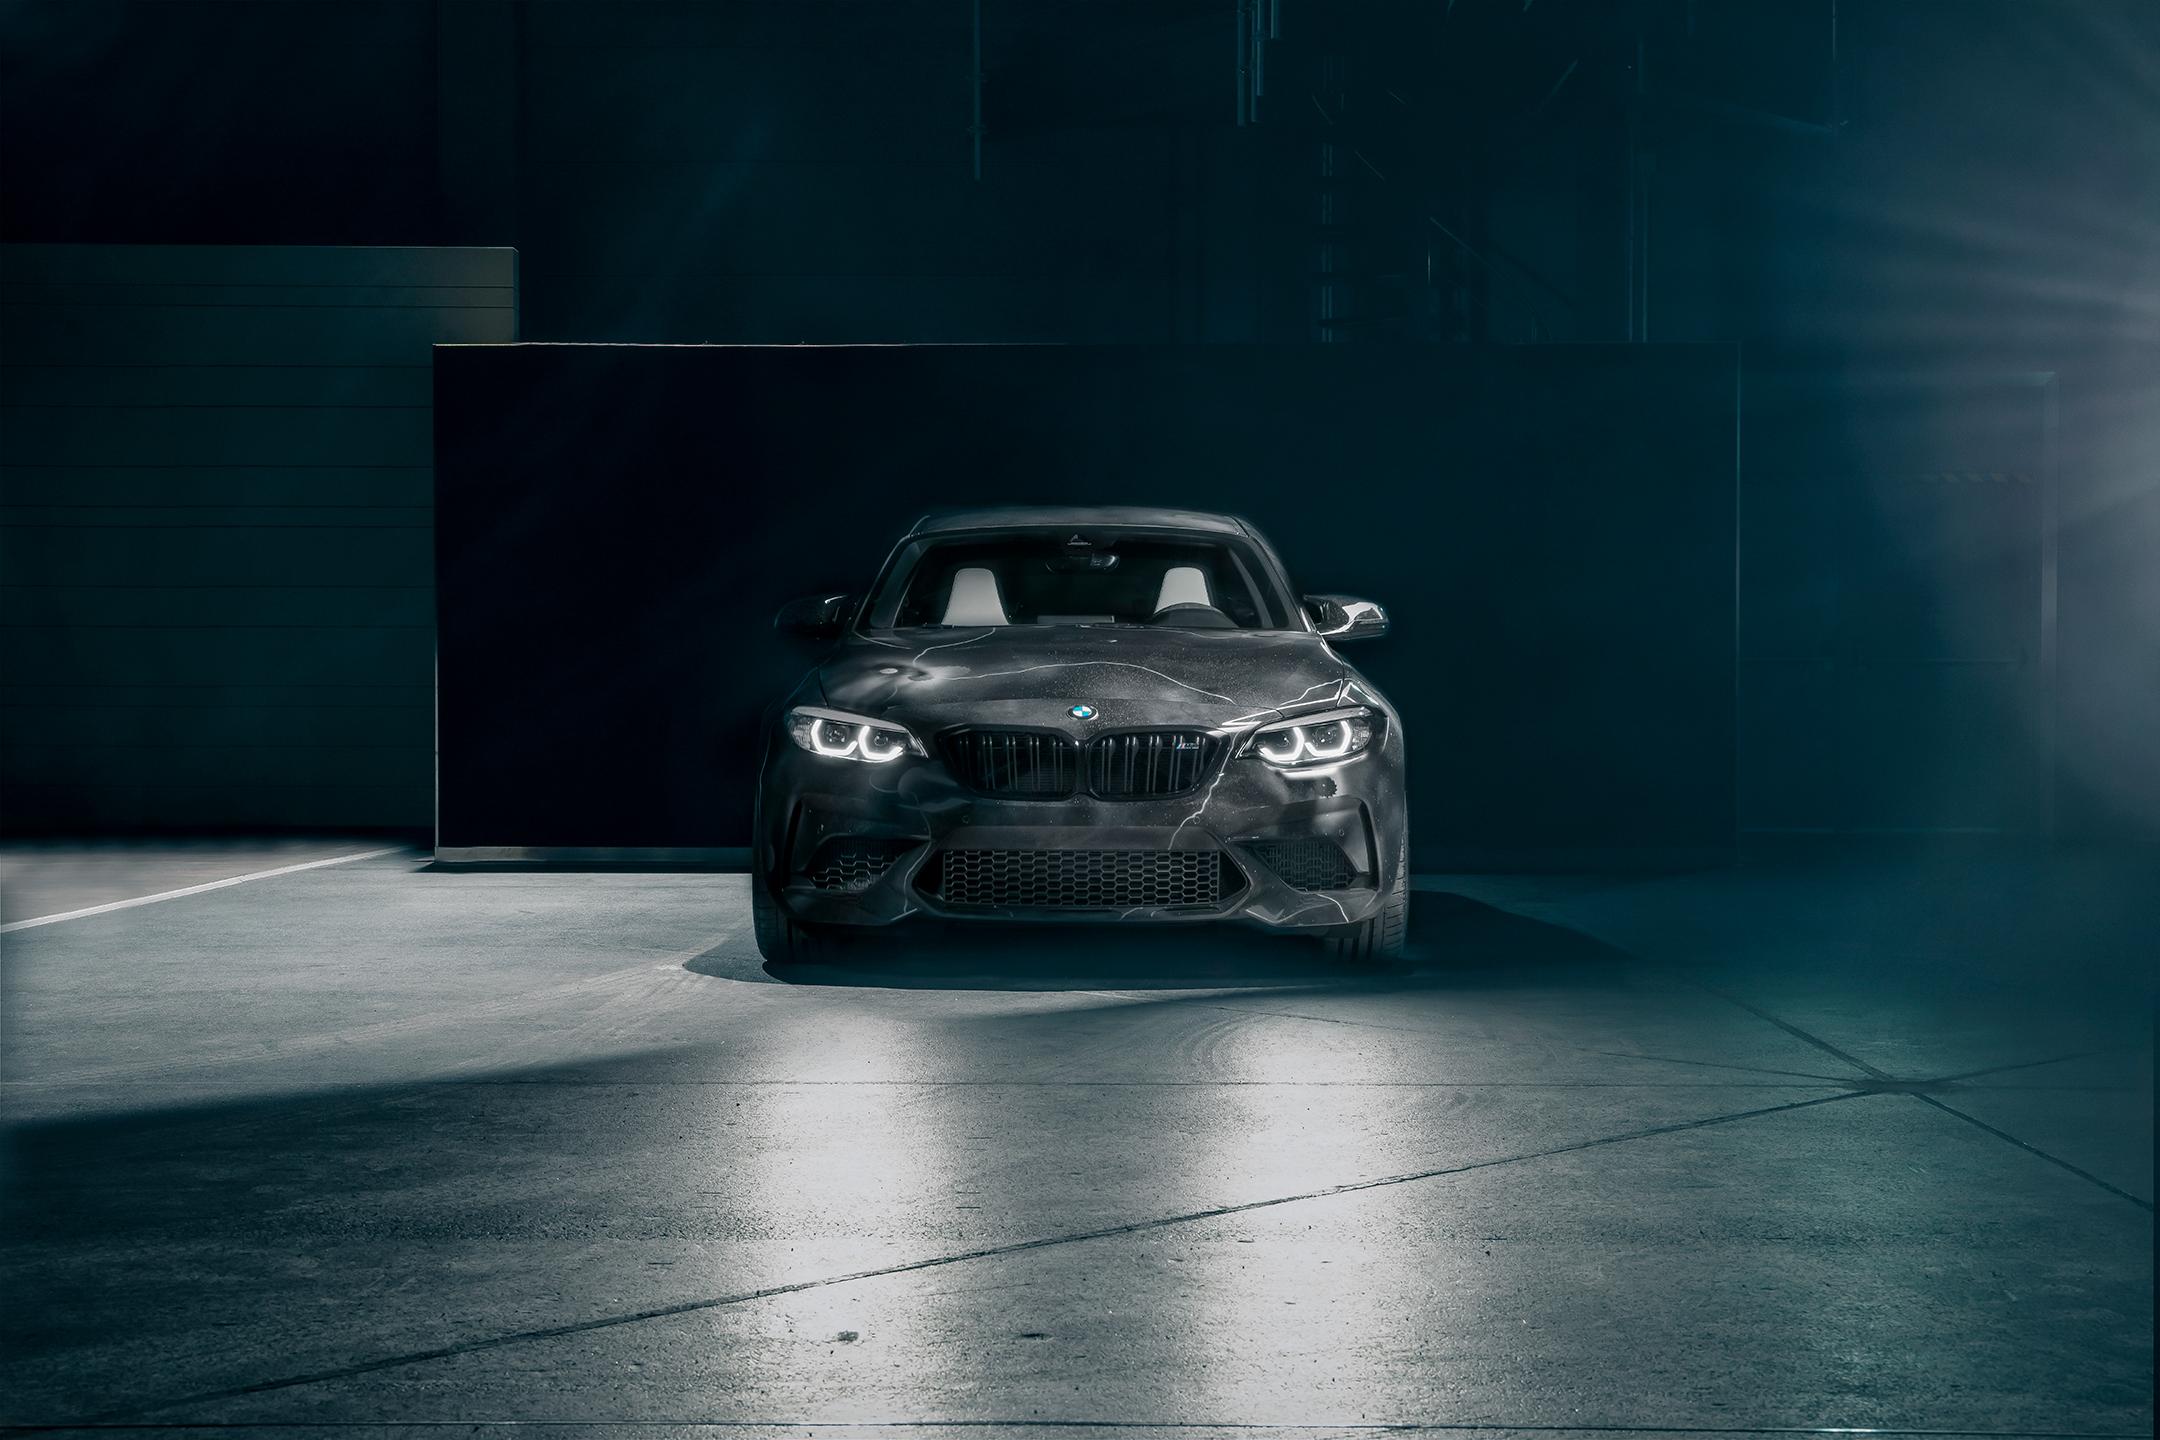 BMW M2 by FUTURA 2000 - Street Art Car - 2020 - front-face / face avant